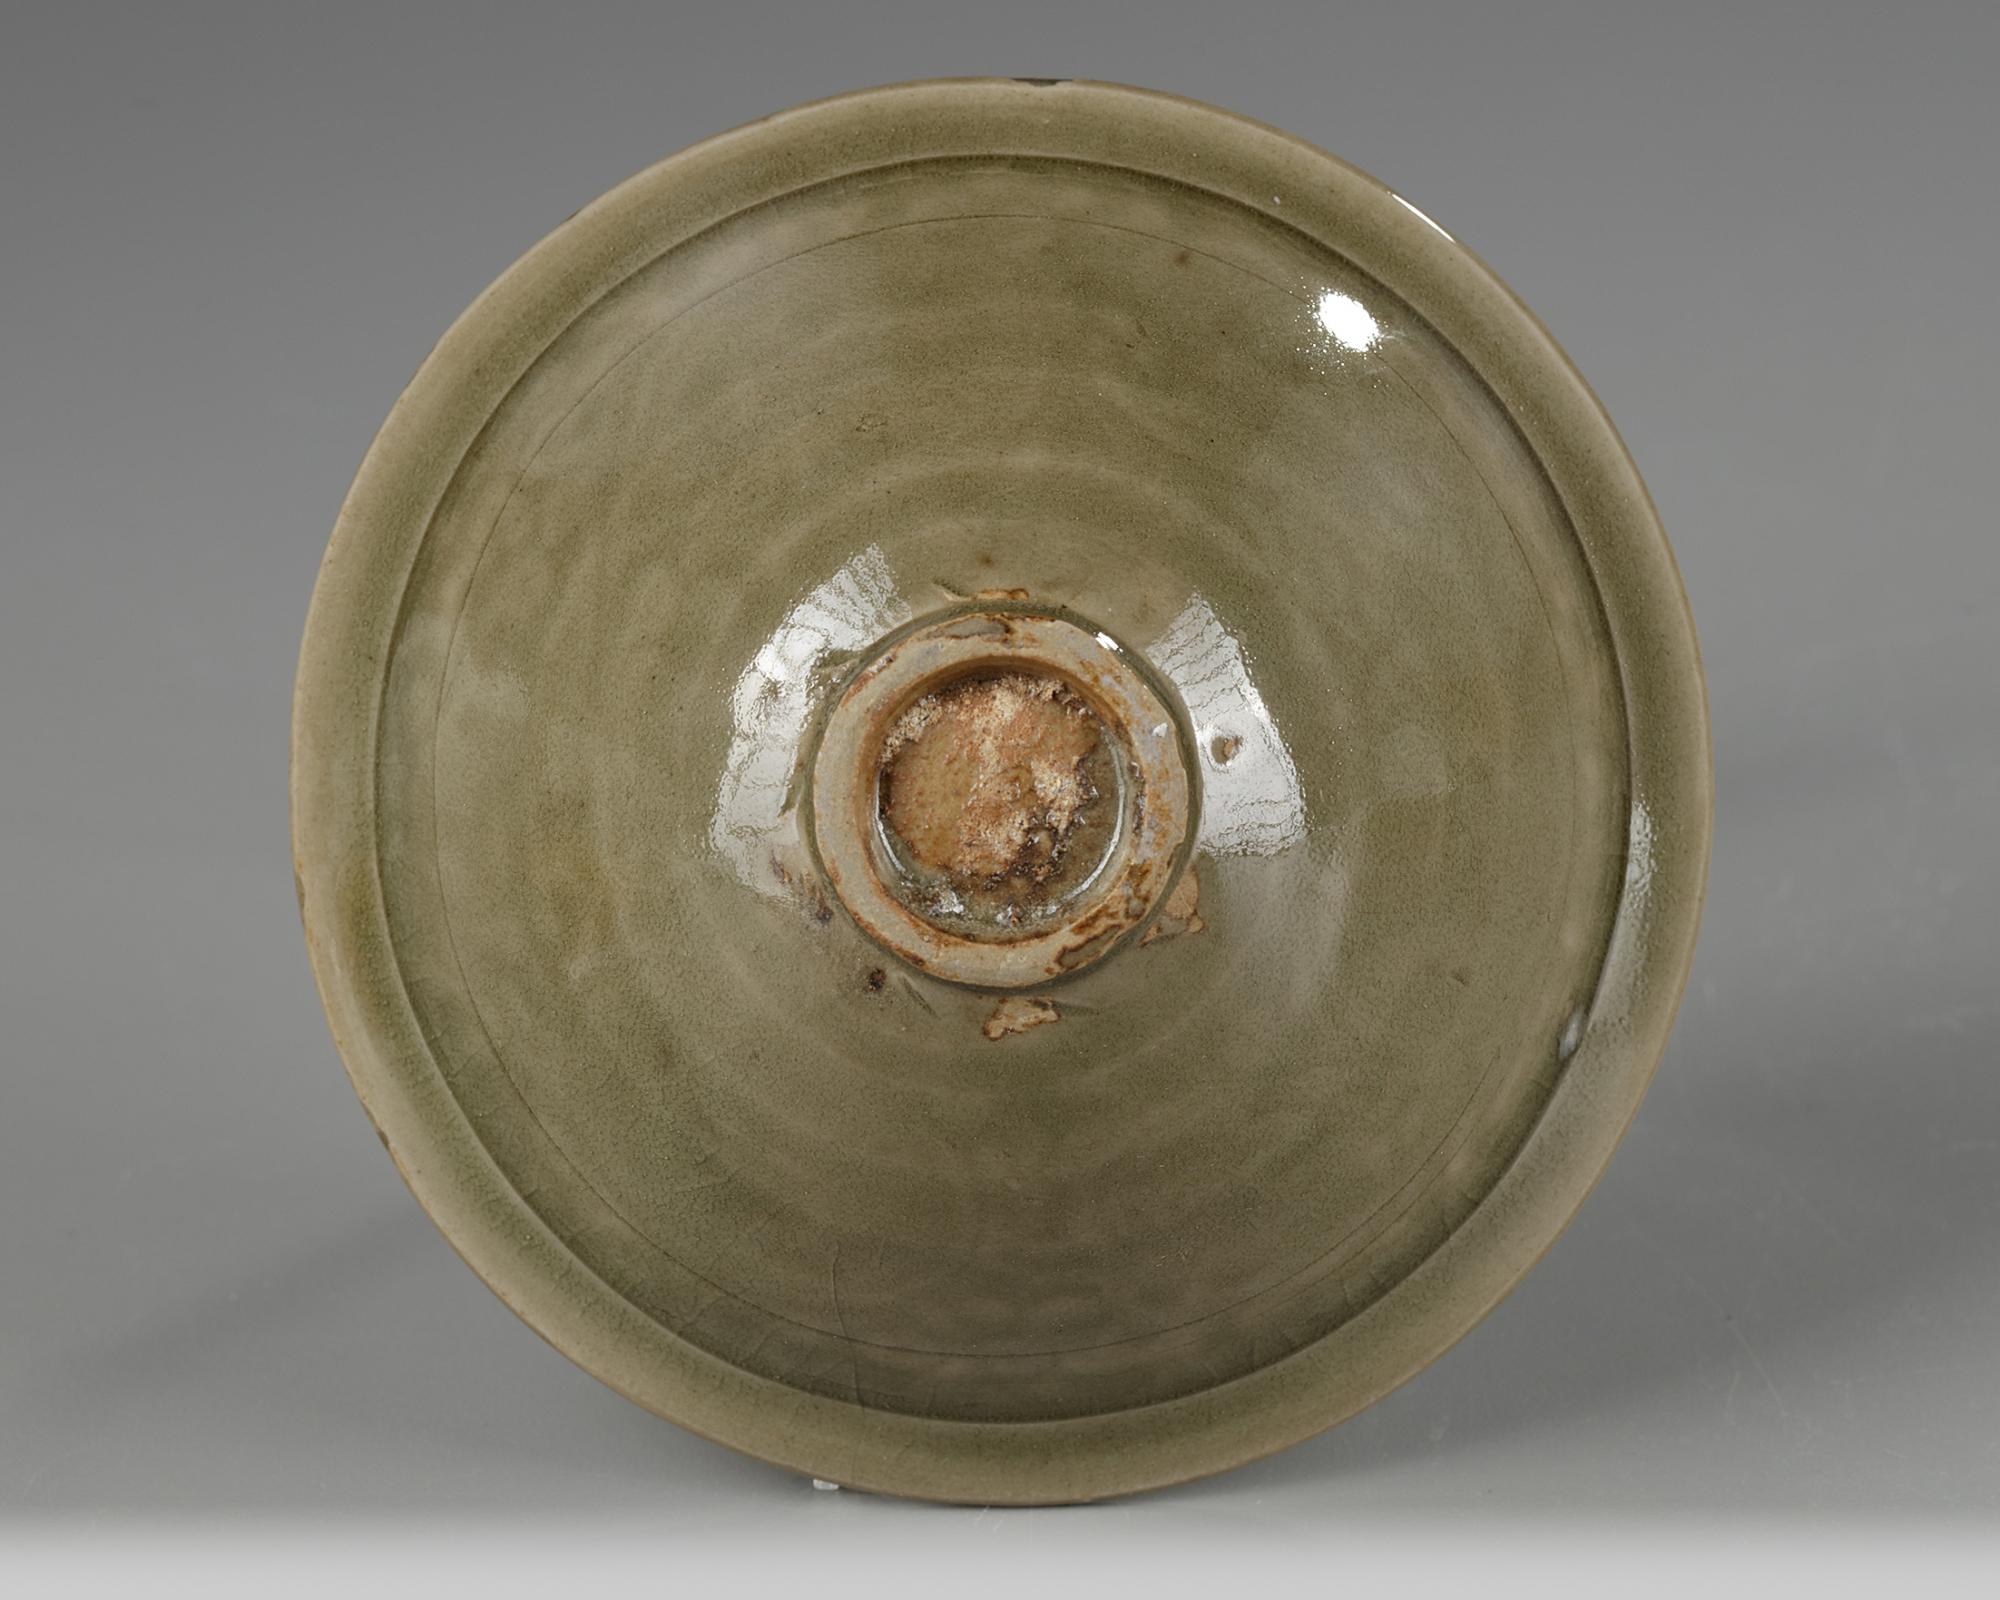 Lot 12 - A Yaozhou celadon-glazed 'chrysanthemum scroll' bowl